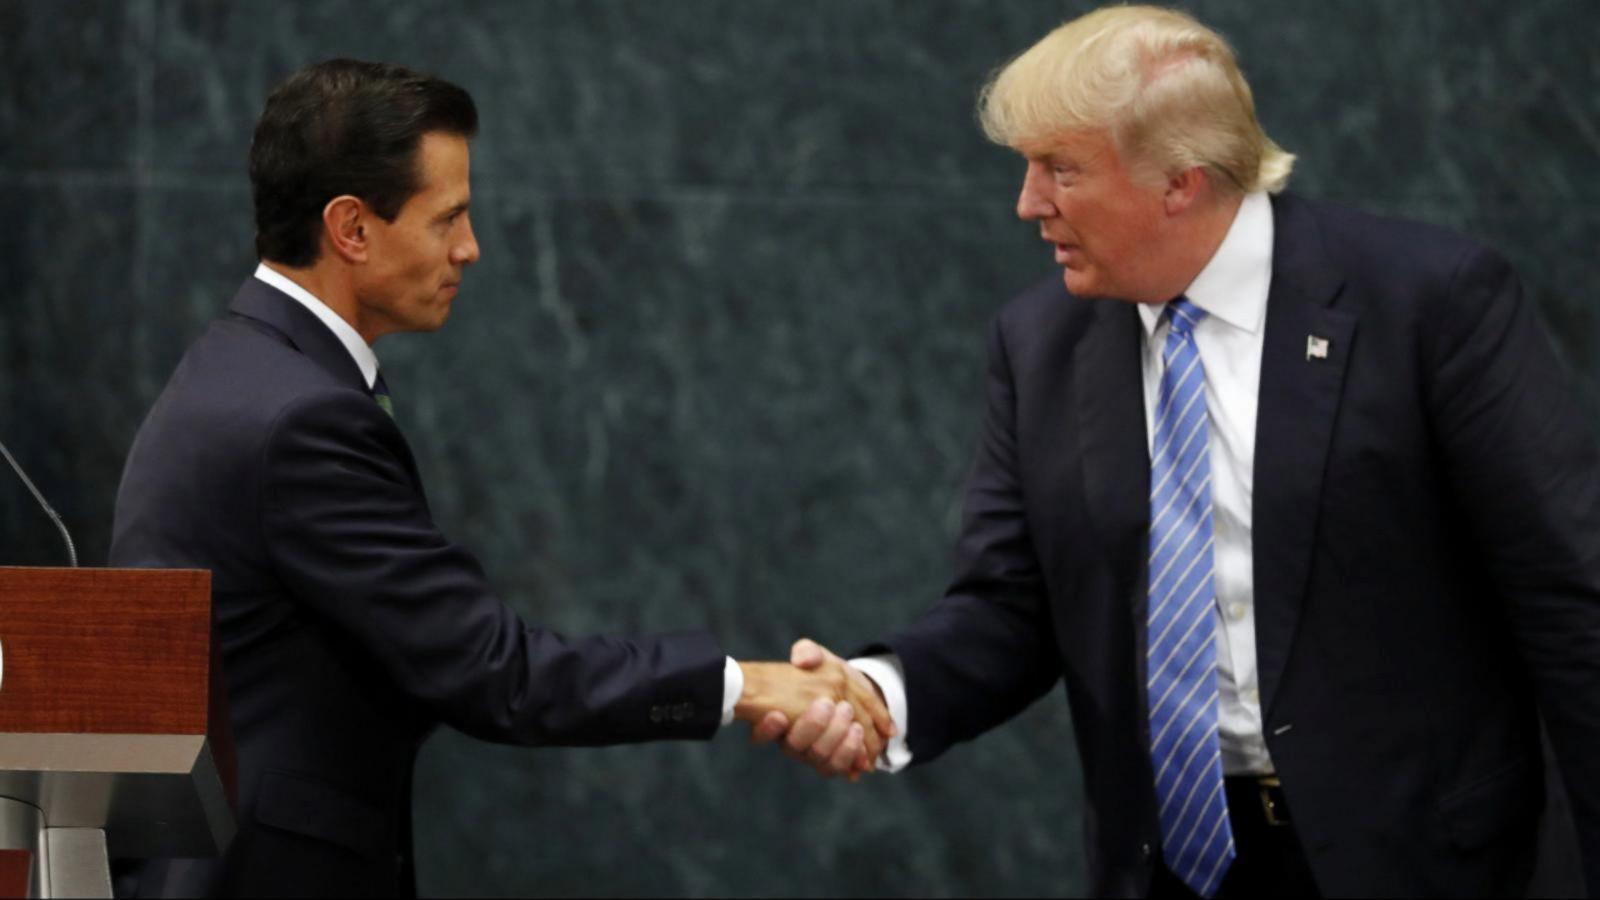 VIDEO: Donald Trump Meets Mexico's President